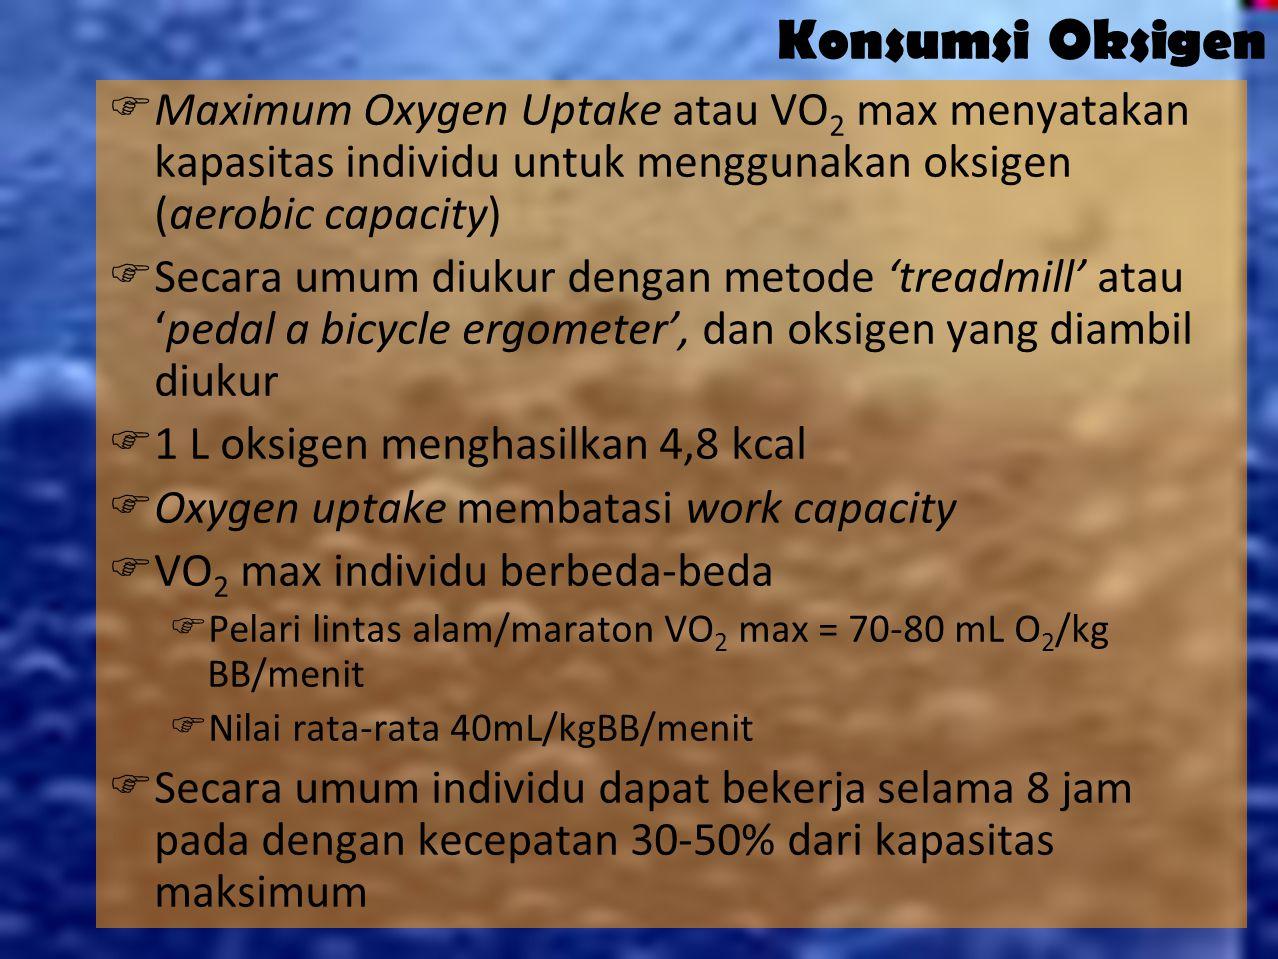 Konsumsi Oksigen Maximum Oxygen Uptake atau VO2 max menyatakan kapasitas individu untuk menggunakan oksigen (aerobic capacity)